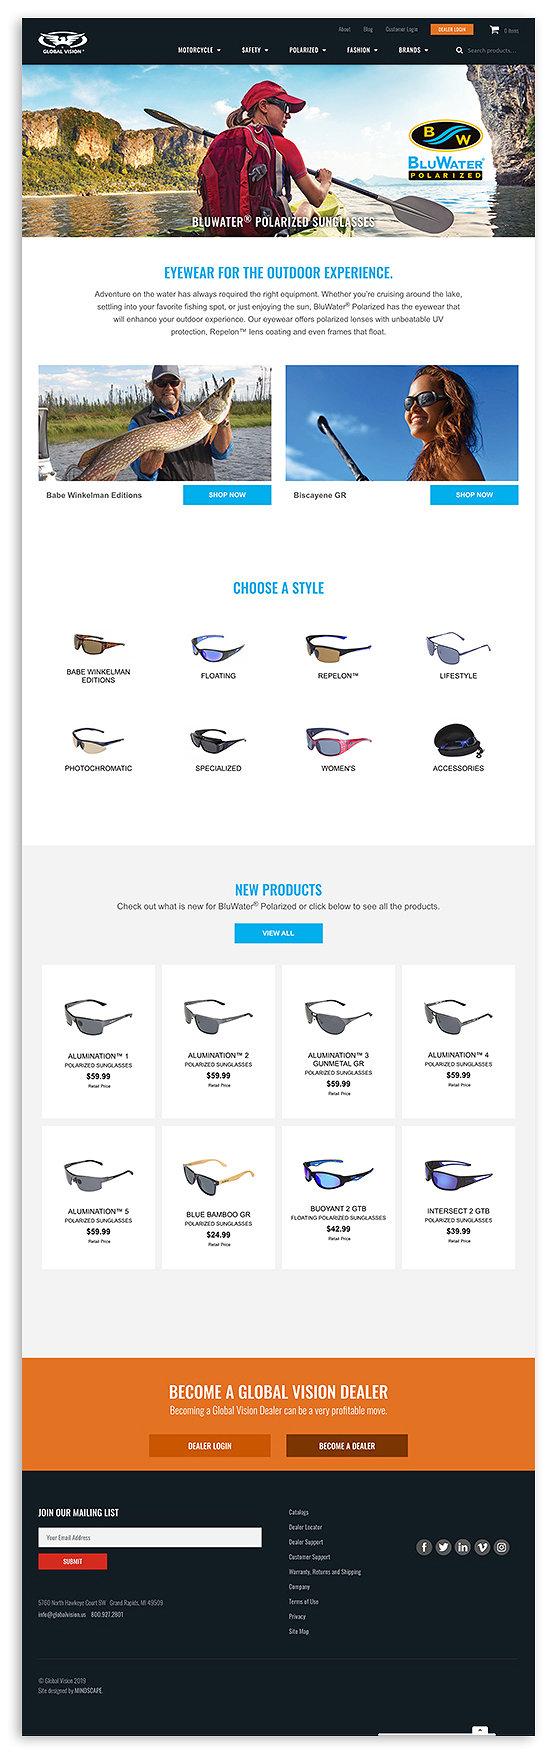 GV-BluWater Polarized_Brand Page web_edi